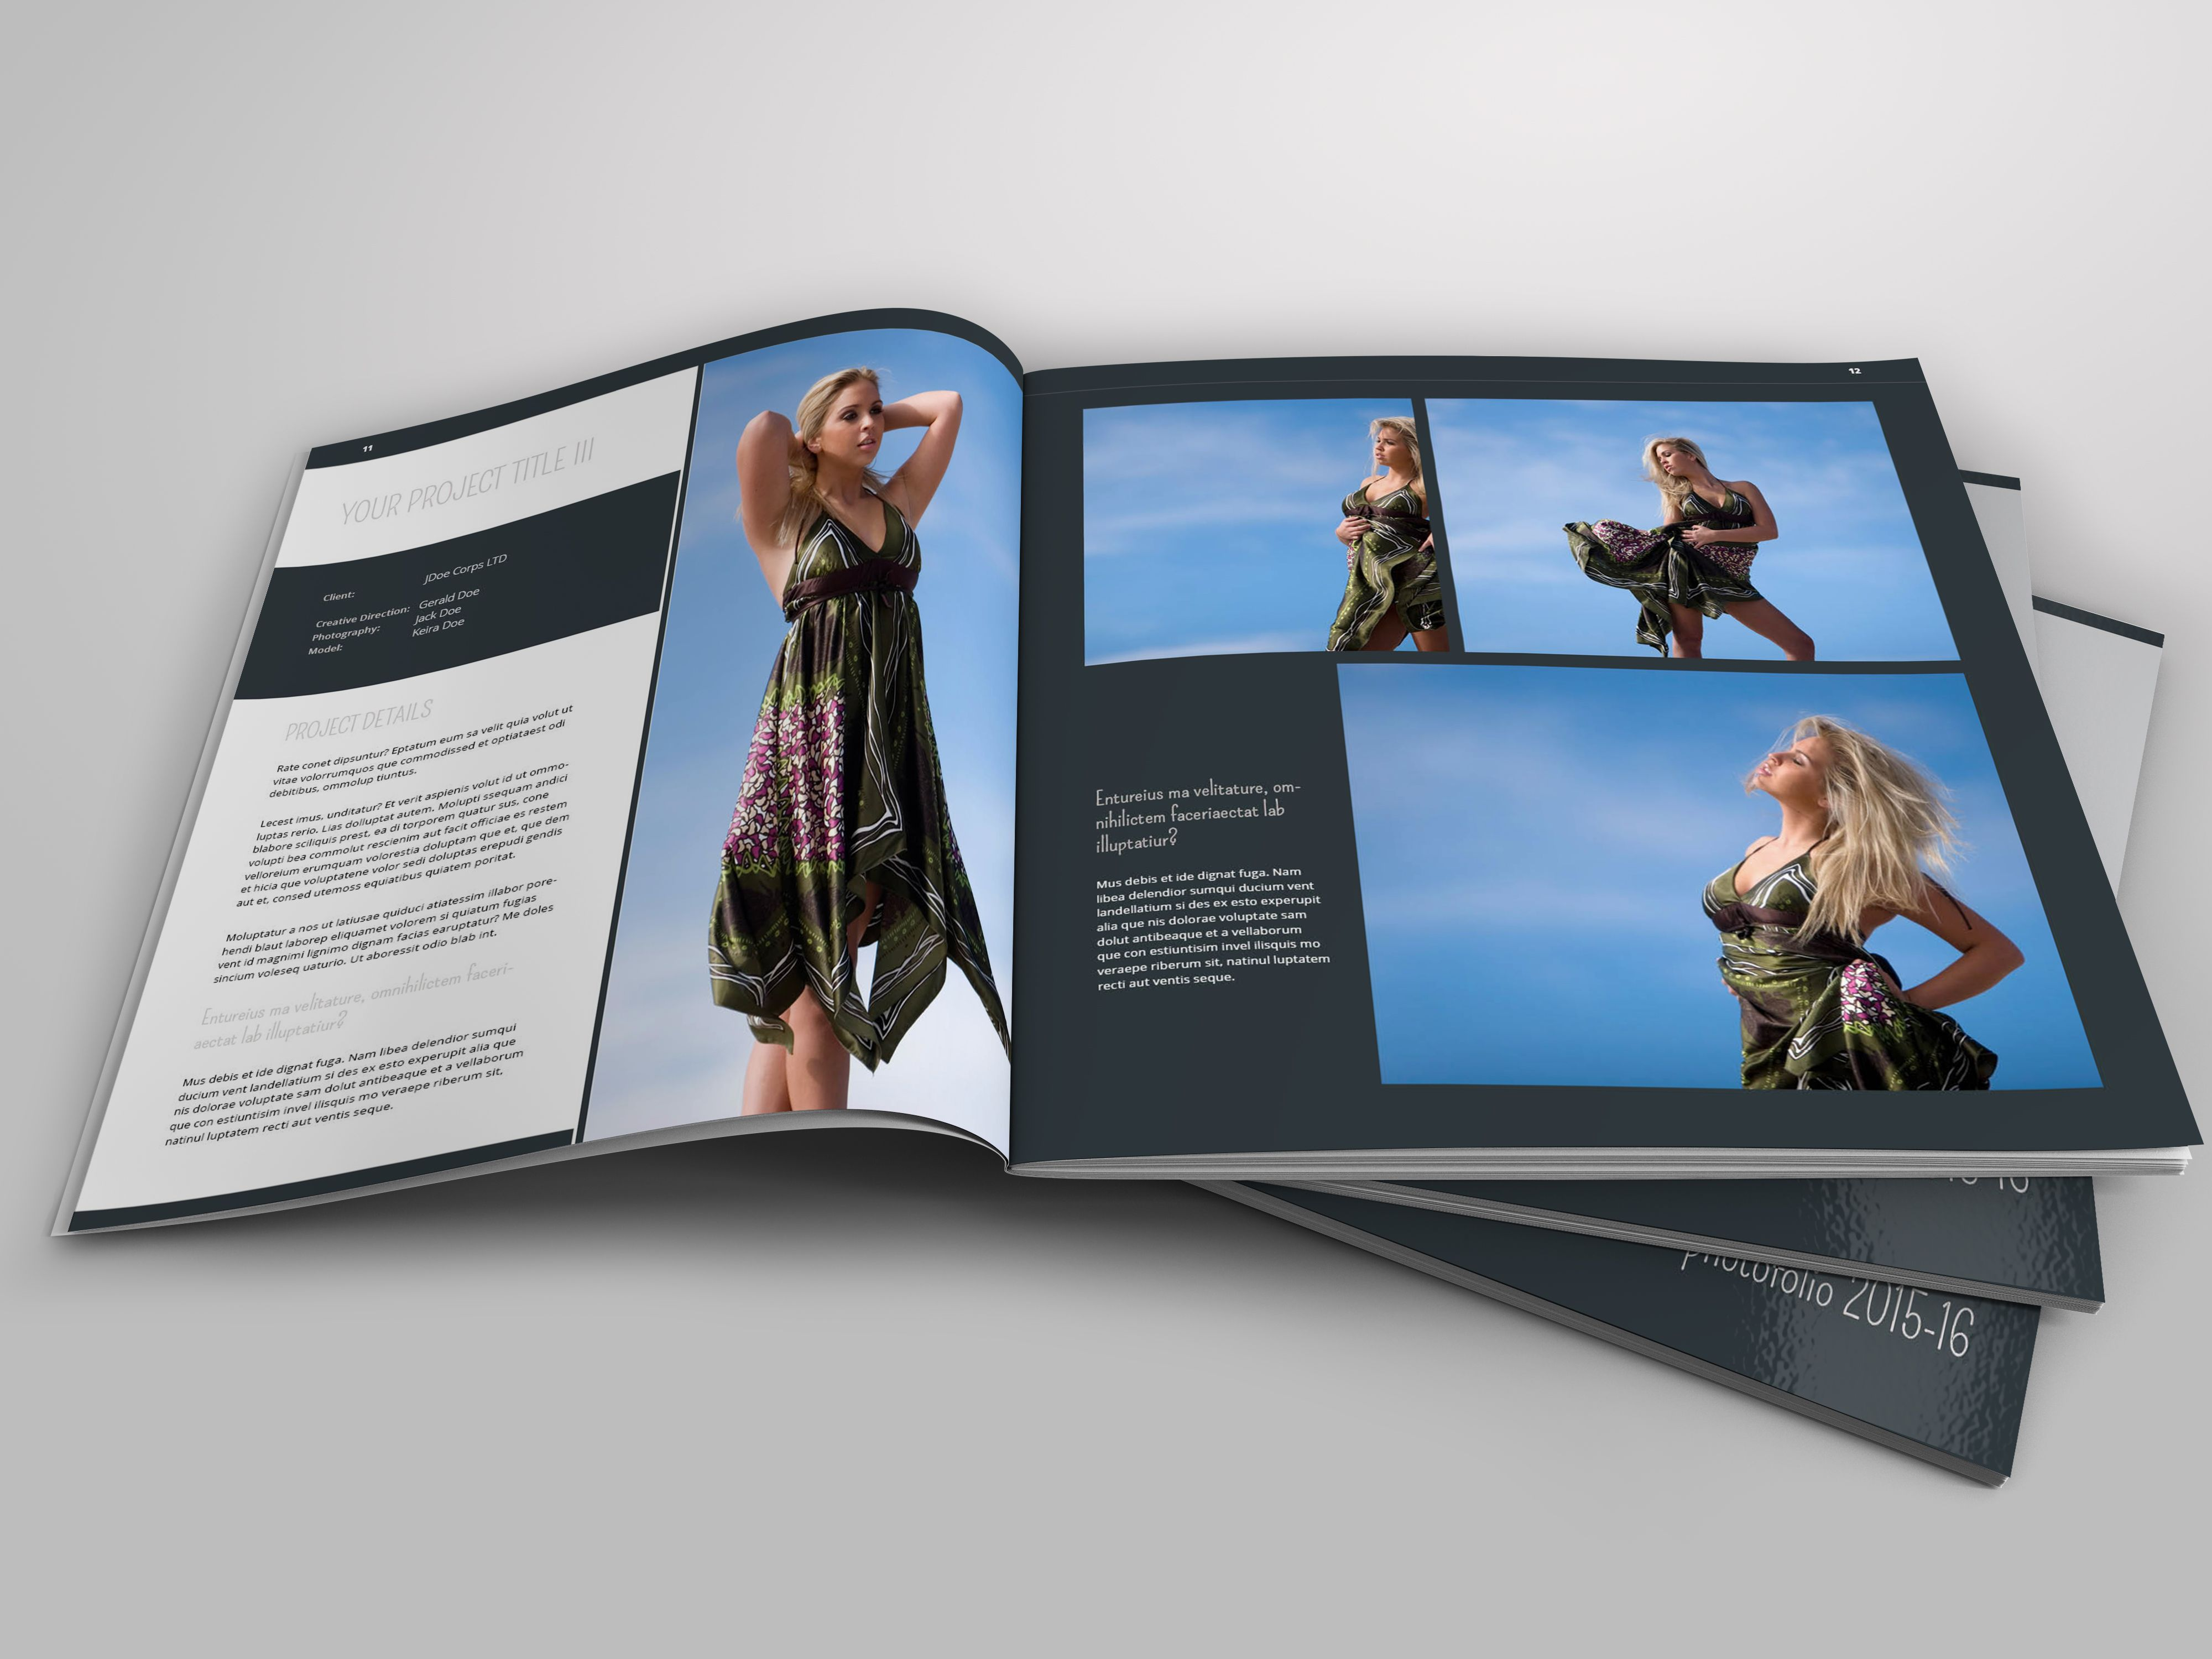 Portfolio Book Template for Indesign CS4 or Later | Design Haven ...